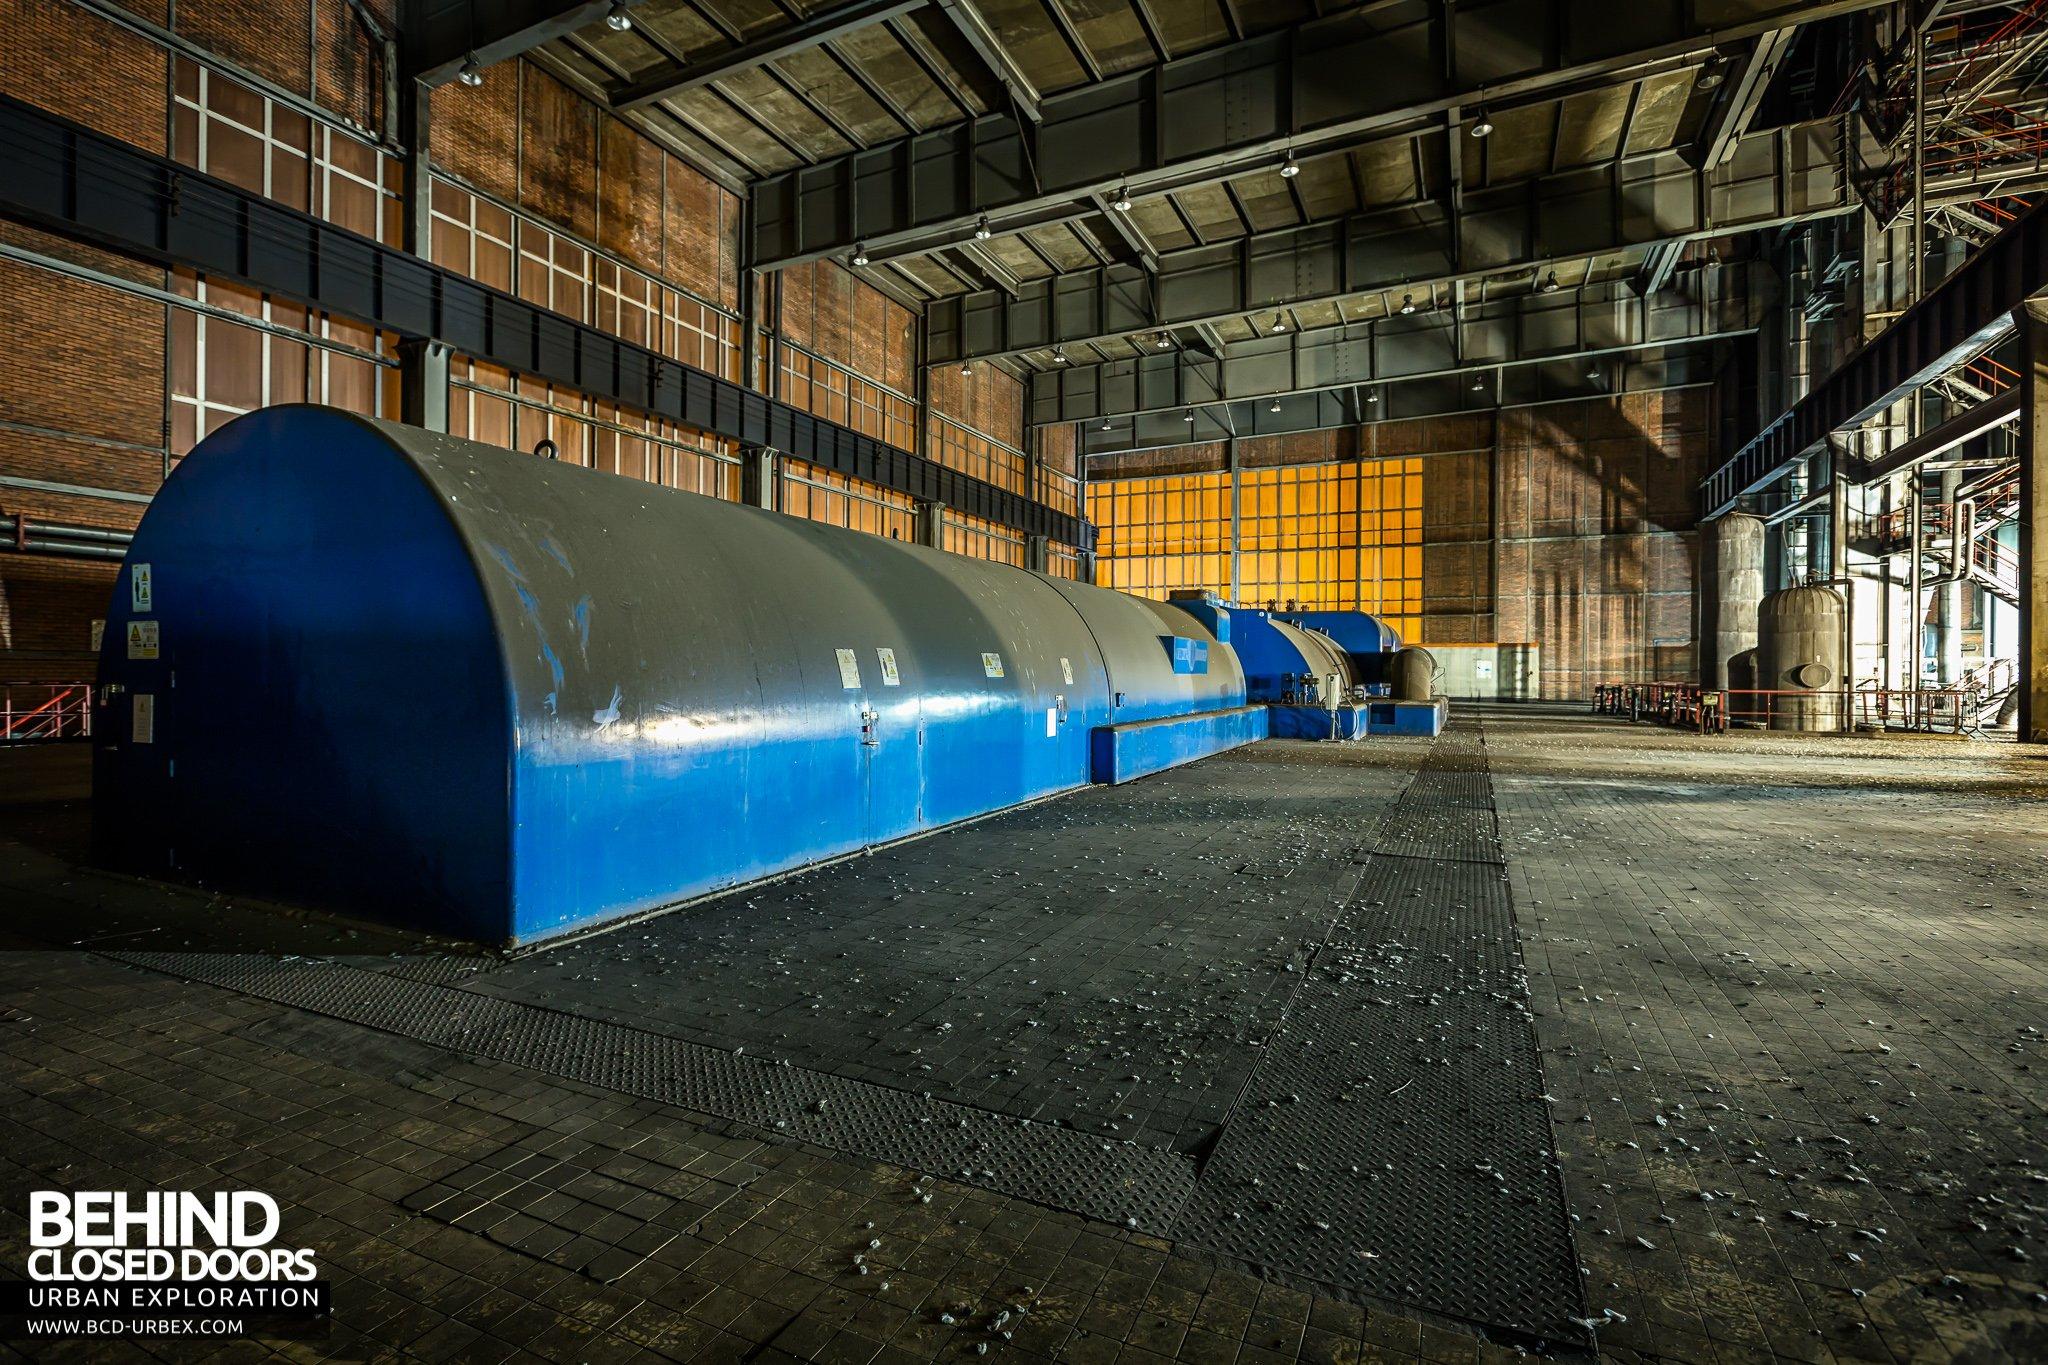 Centrale De Schneider Power Plant France 187 Urbex Behind